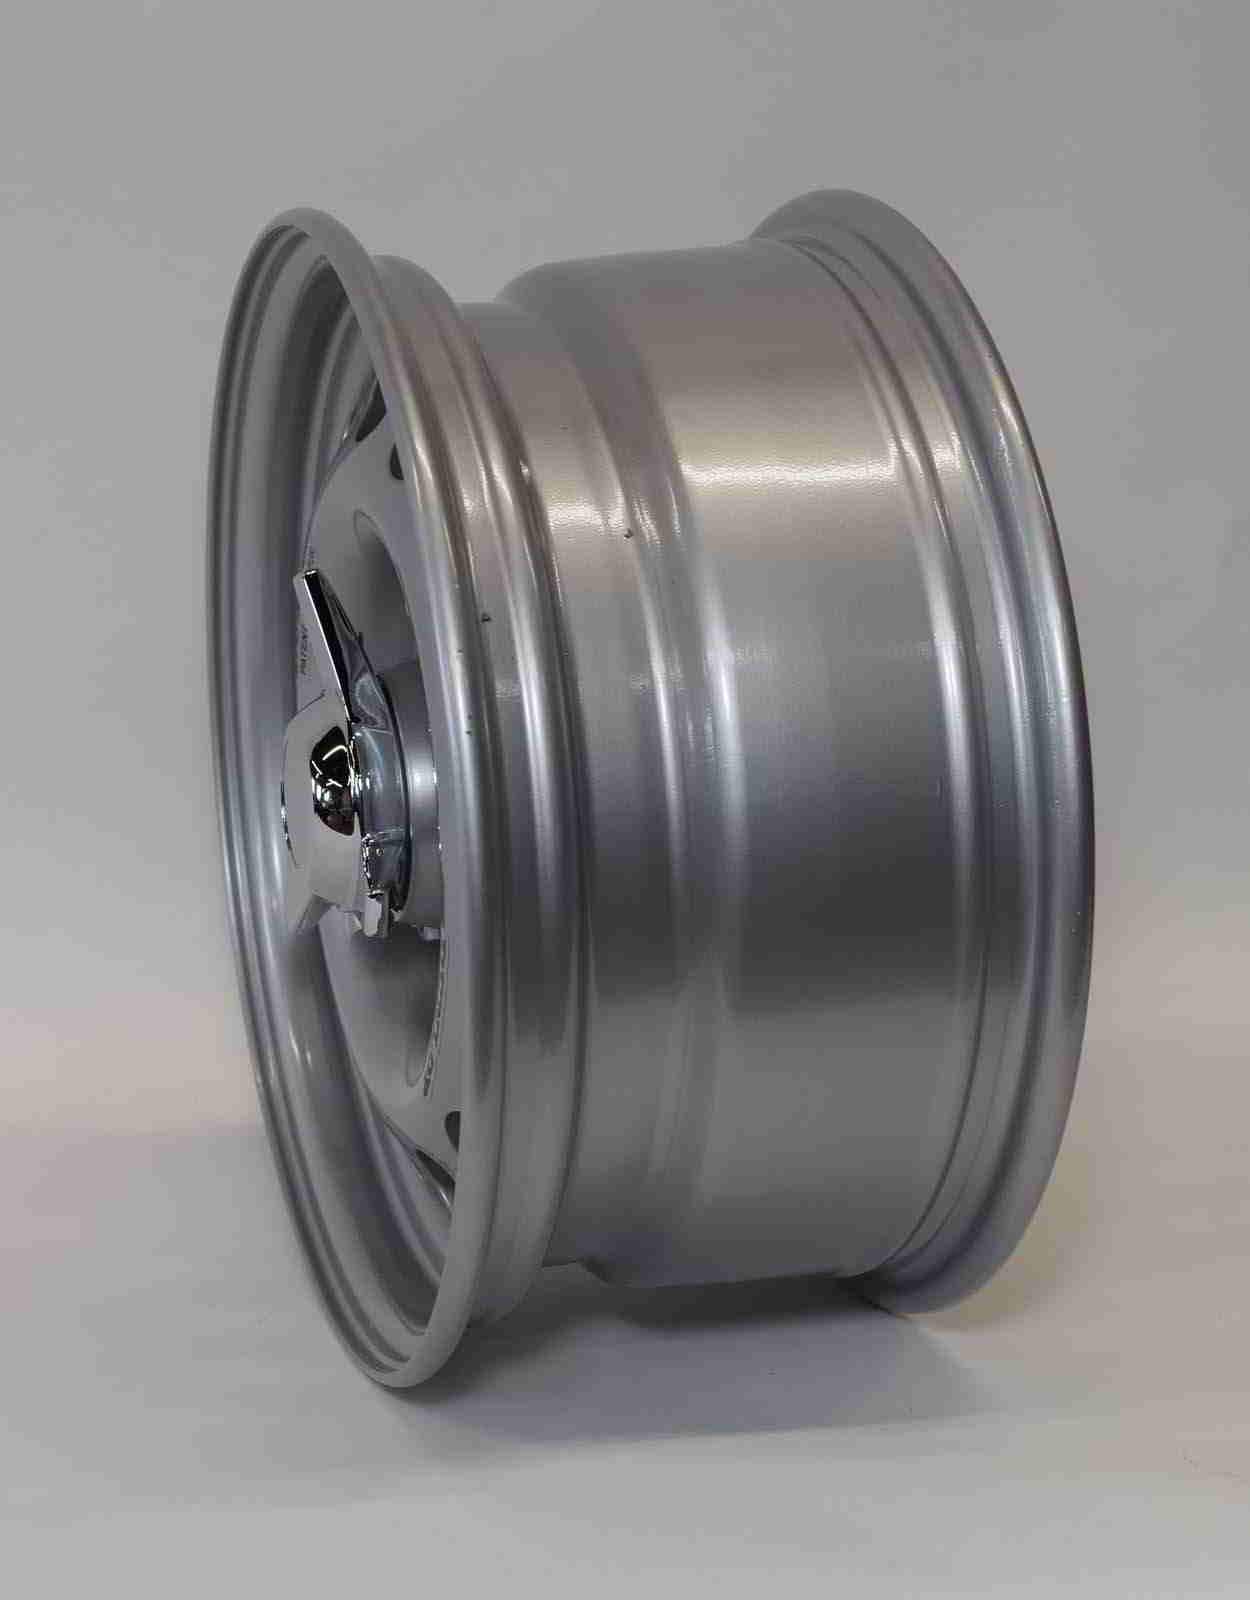 Dunlop style allow wheel